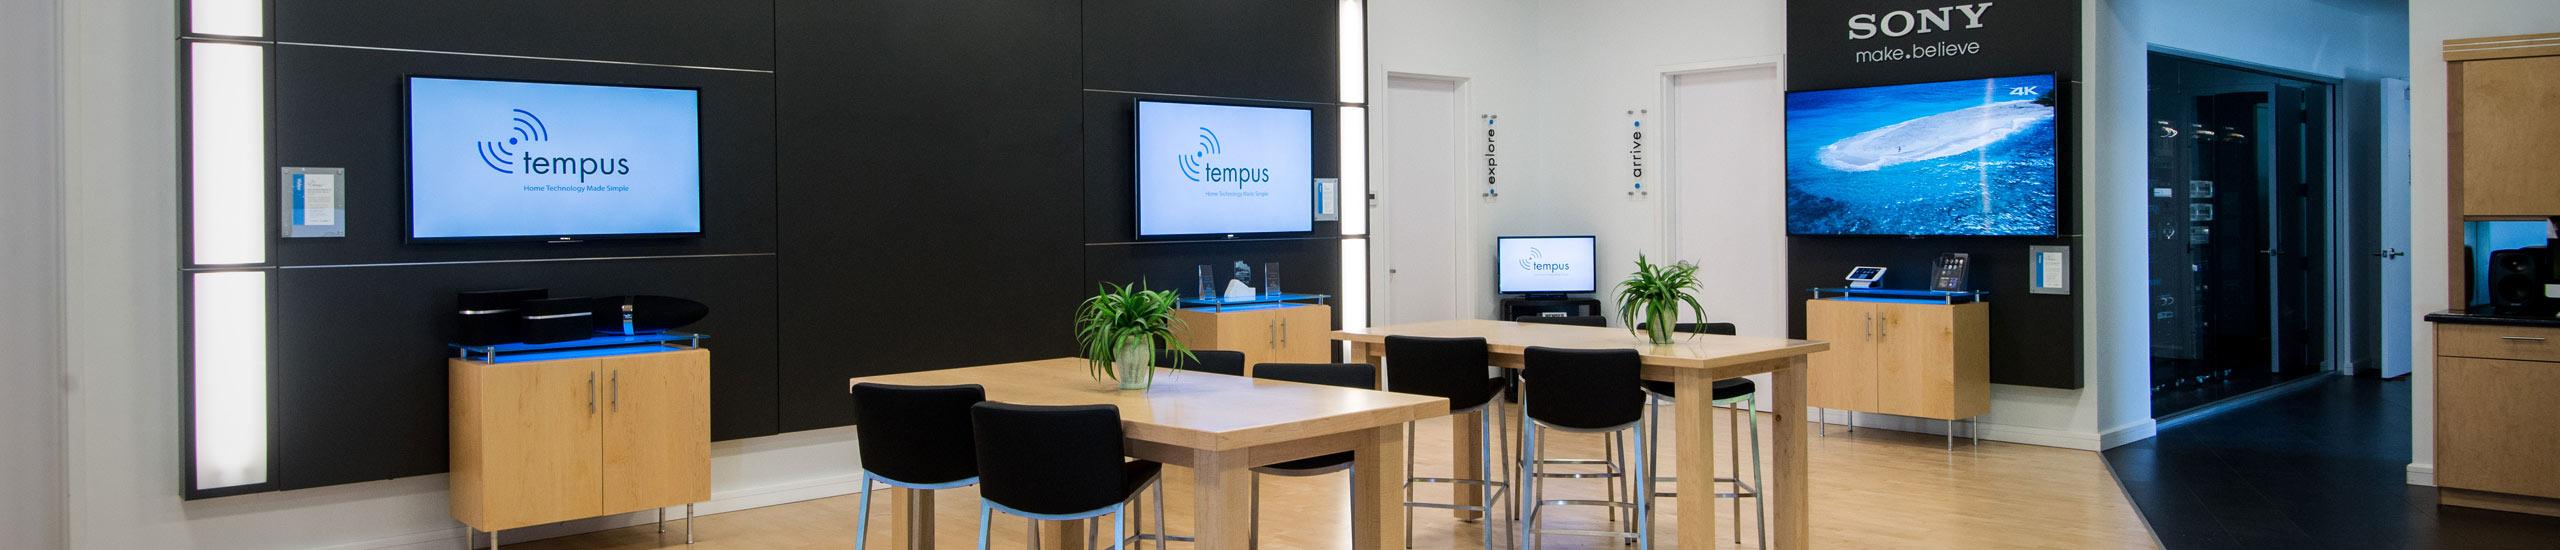 Tempus-Banner-Residential-web